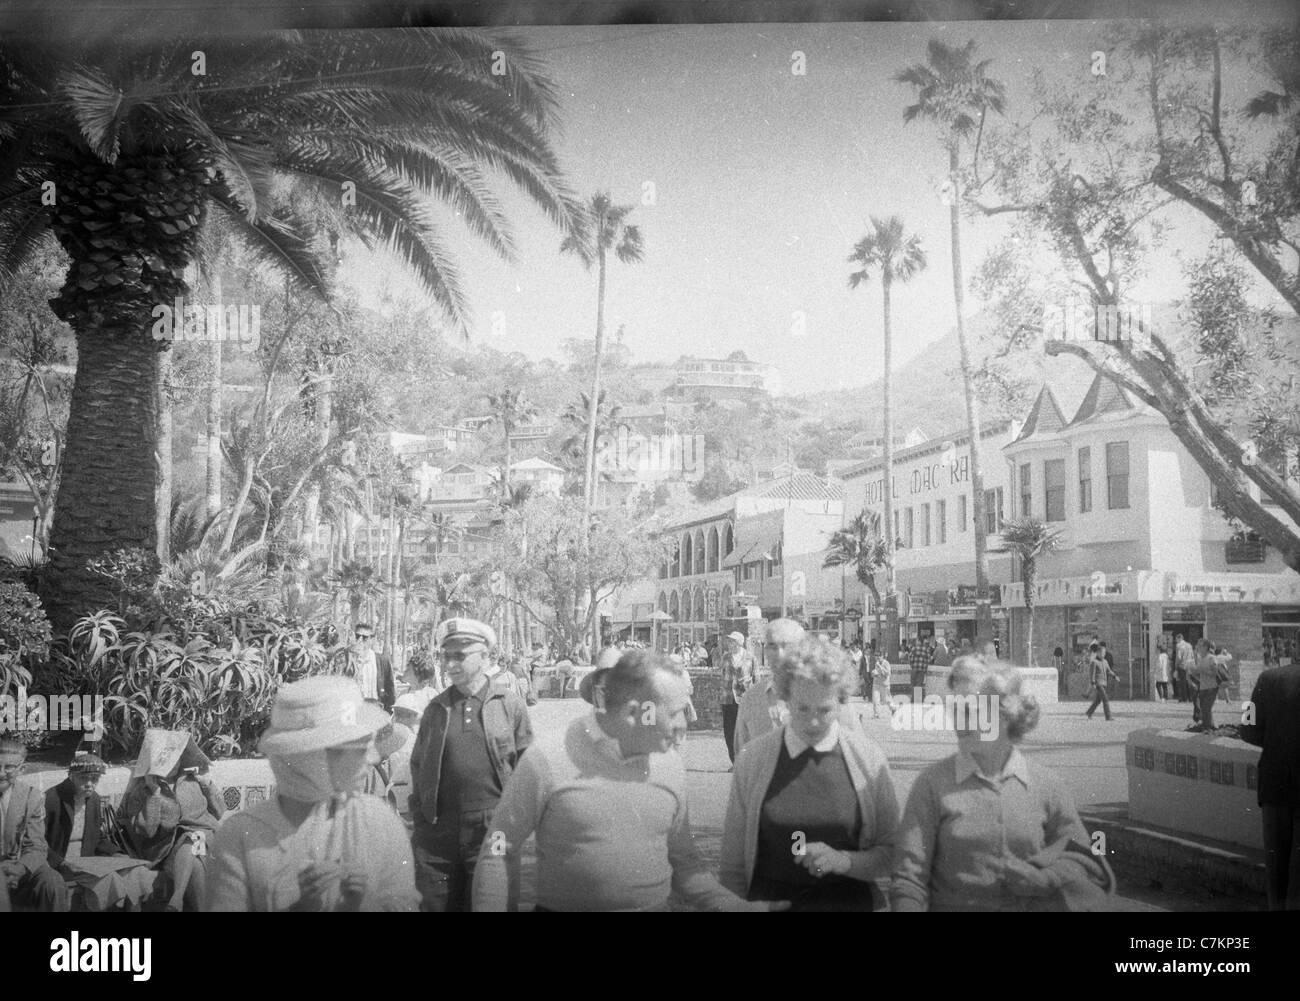 1950s California Stock Photos Amp 1950s California Stock